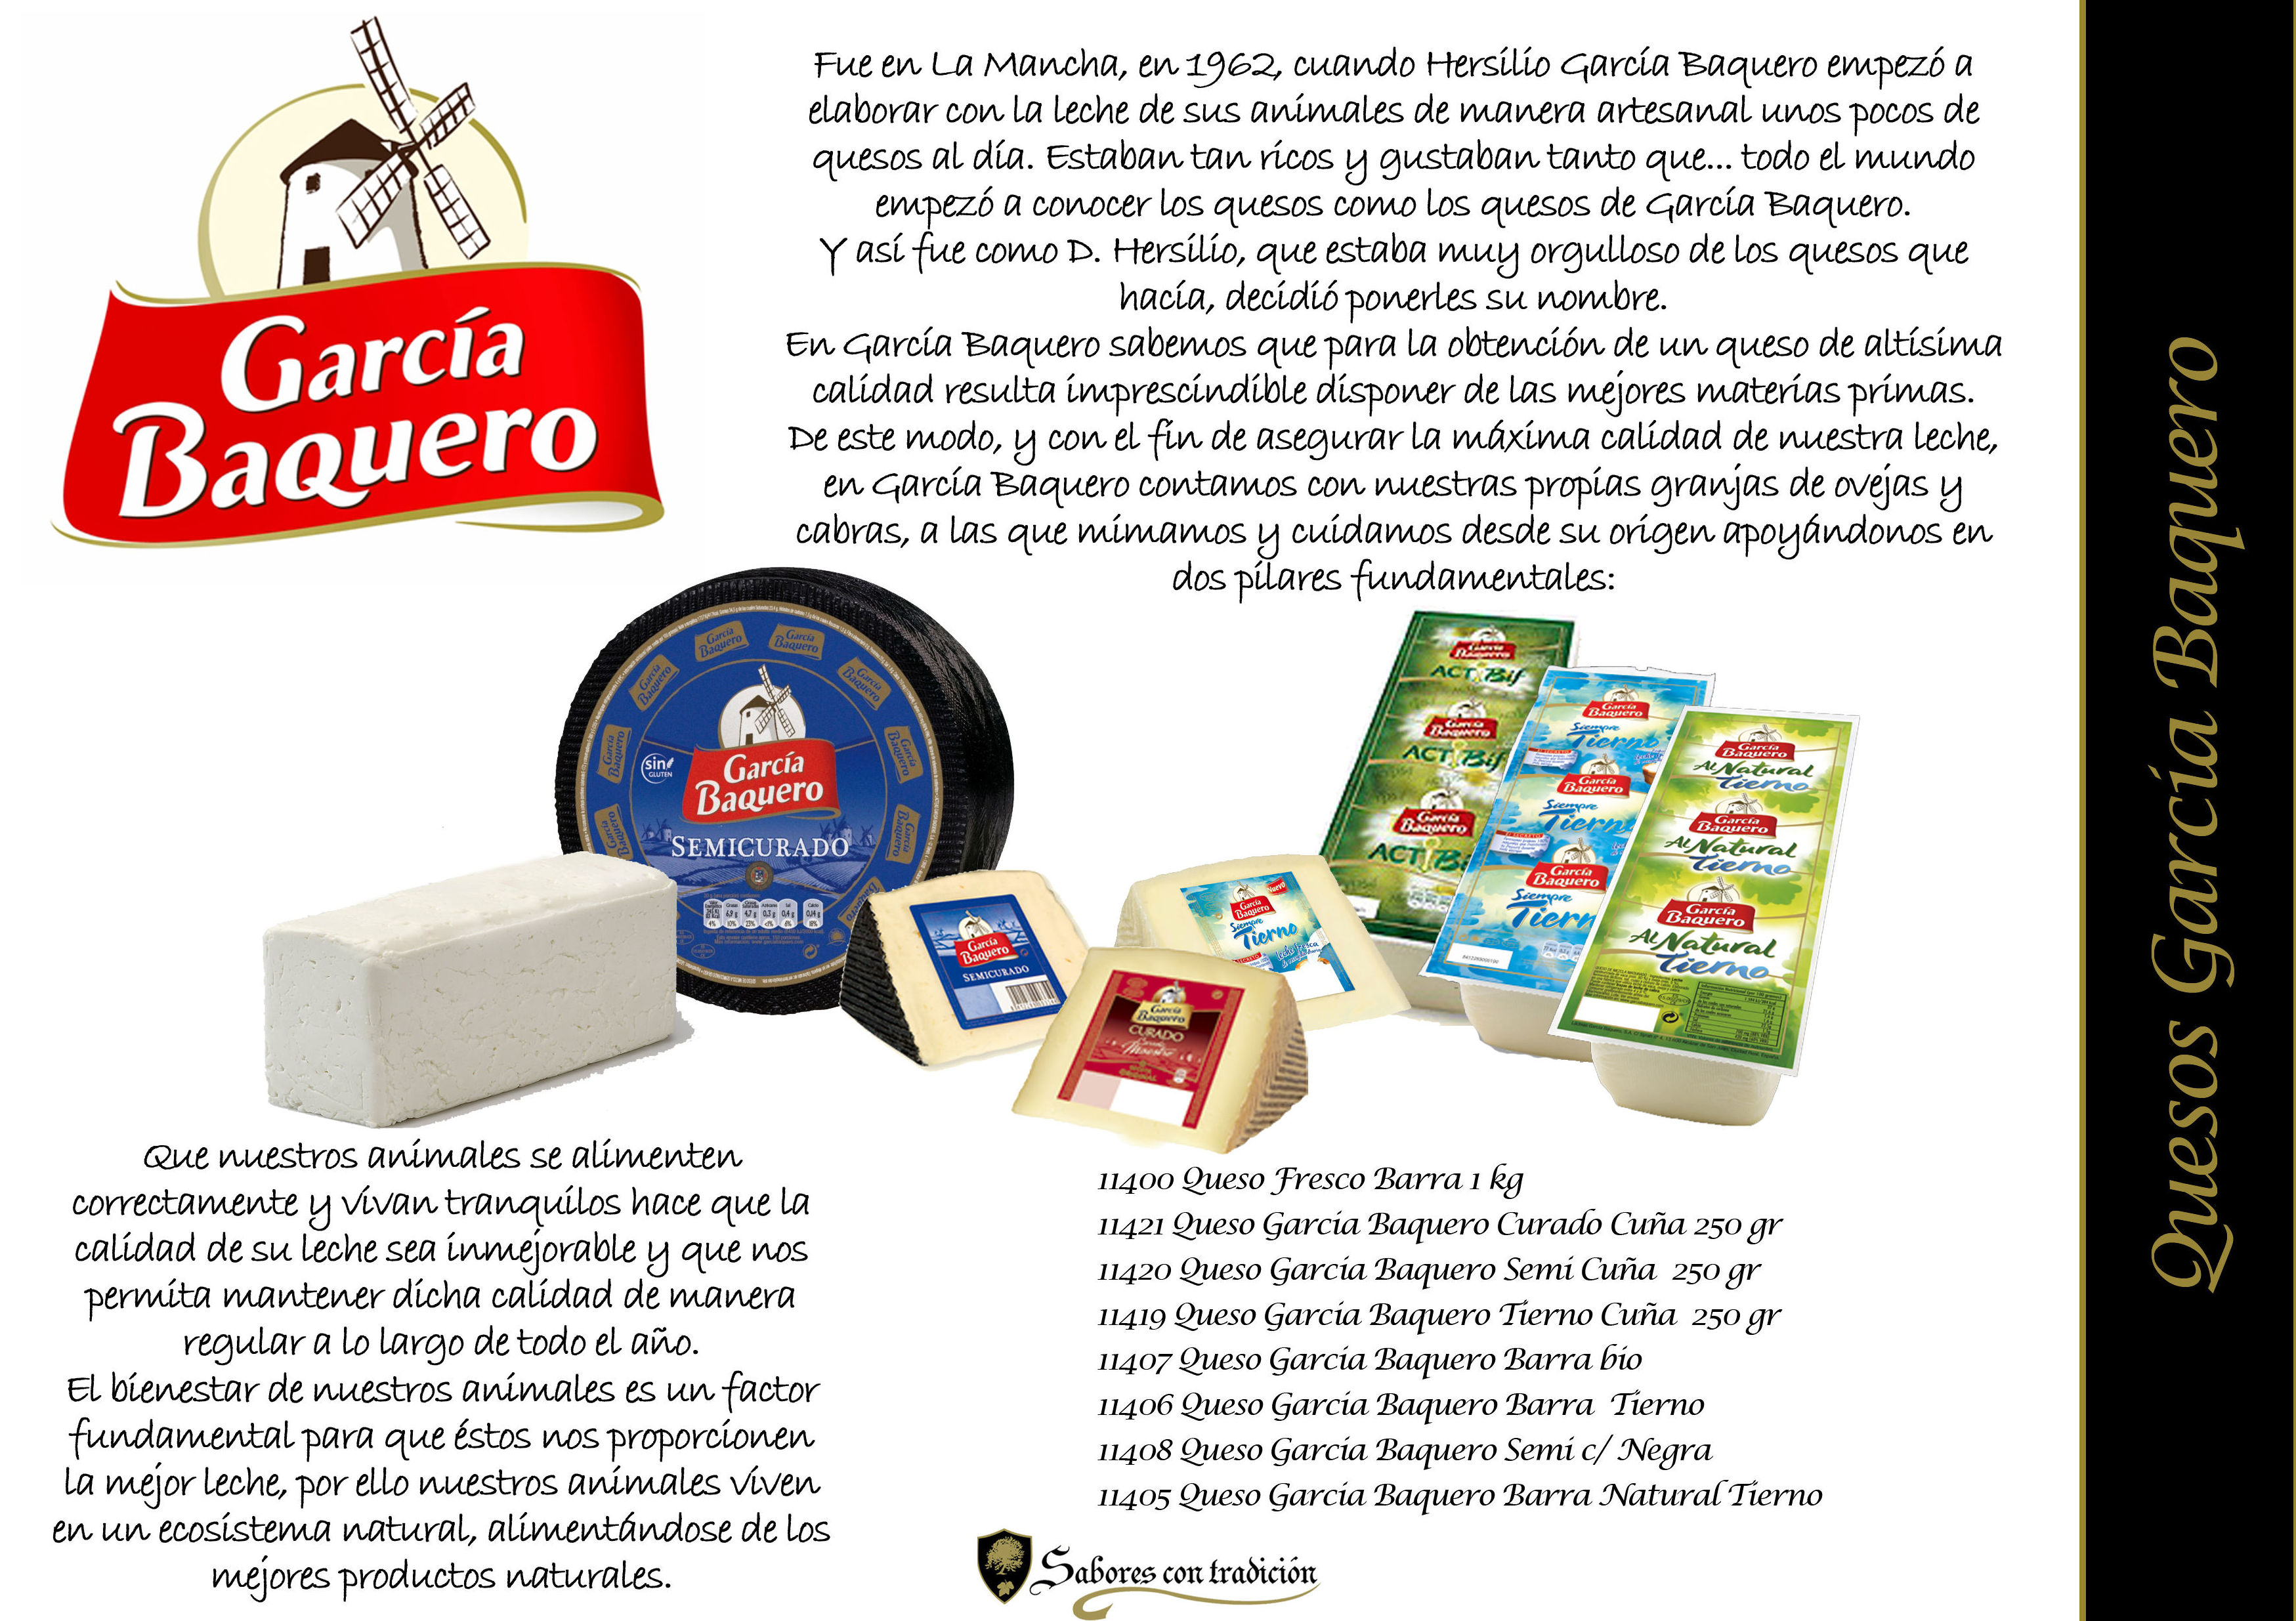 "Quesos "" Garcia Baquero """